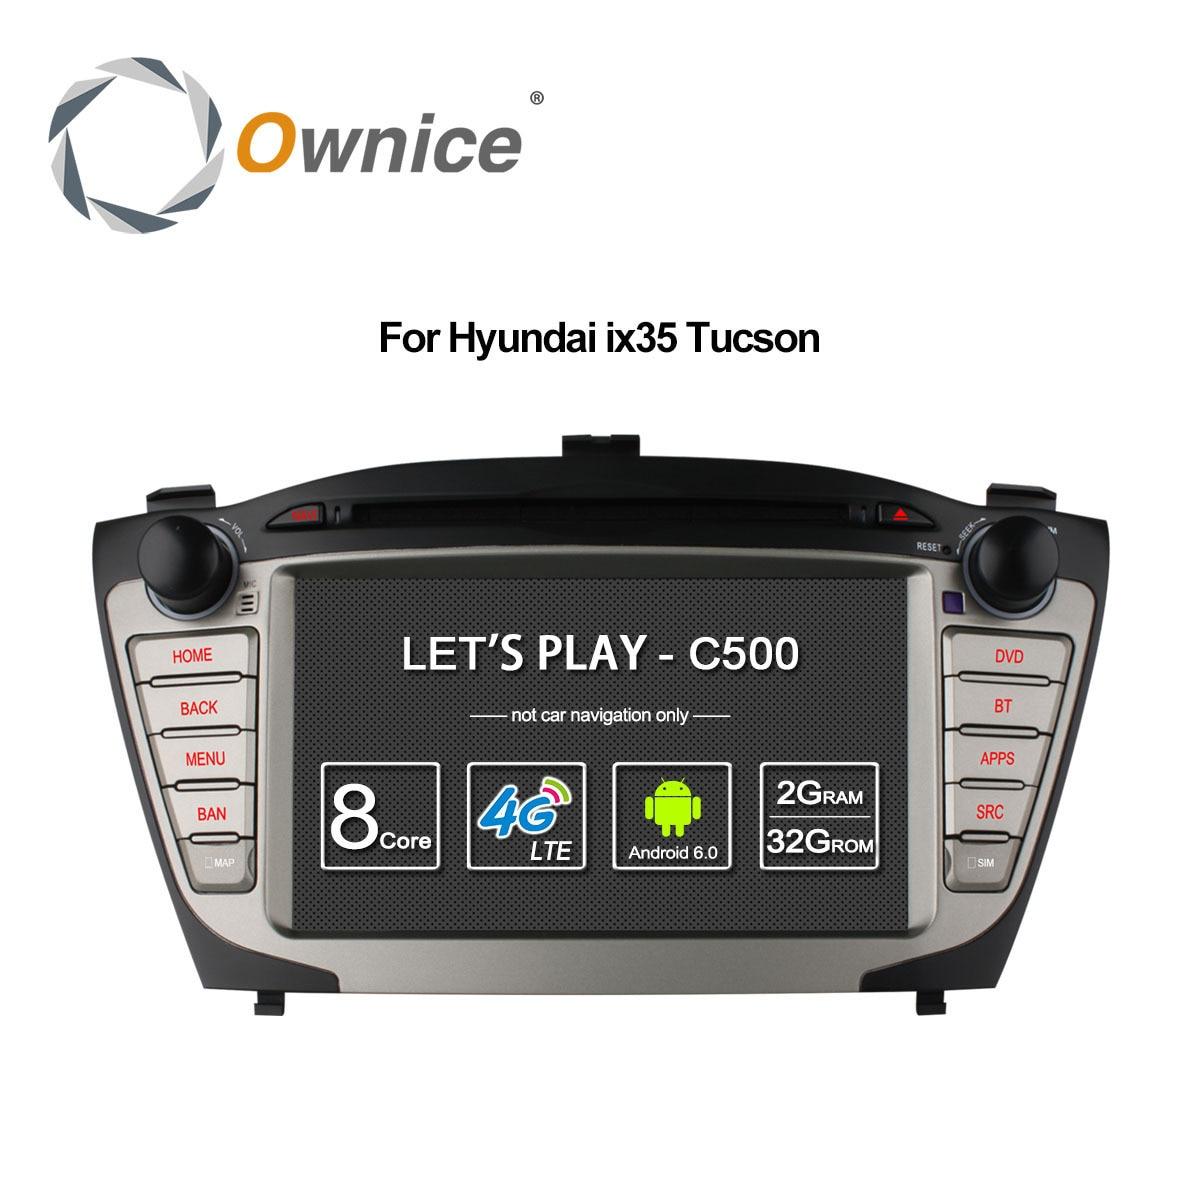 Ownice C500 4g SIM LTE pour Hyundai iX35 Tucson 2009-2015 Android 6.0 8 Core 2 din voiture dvd gps radio 2 gb RAM 32 gb soutien DAB +